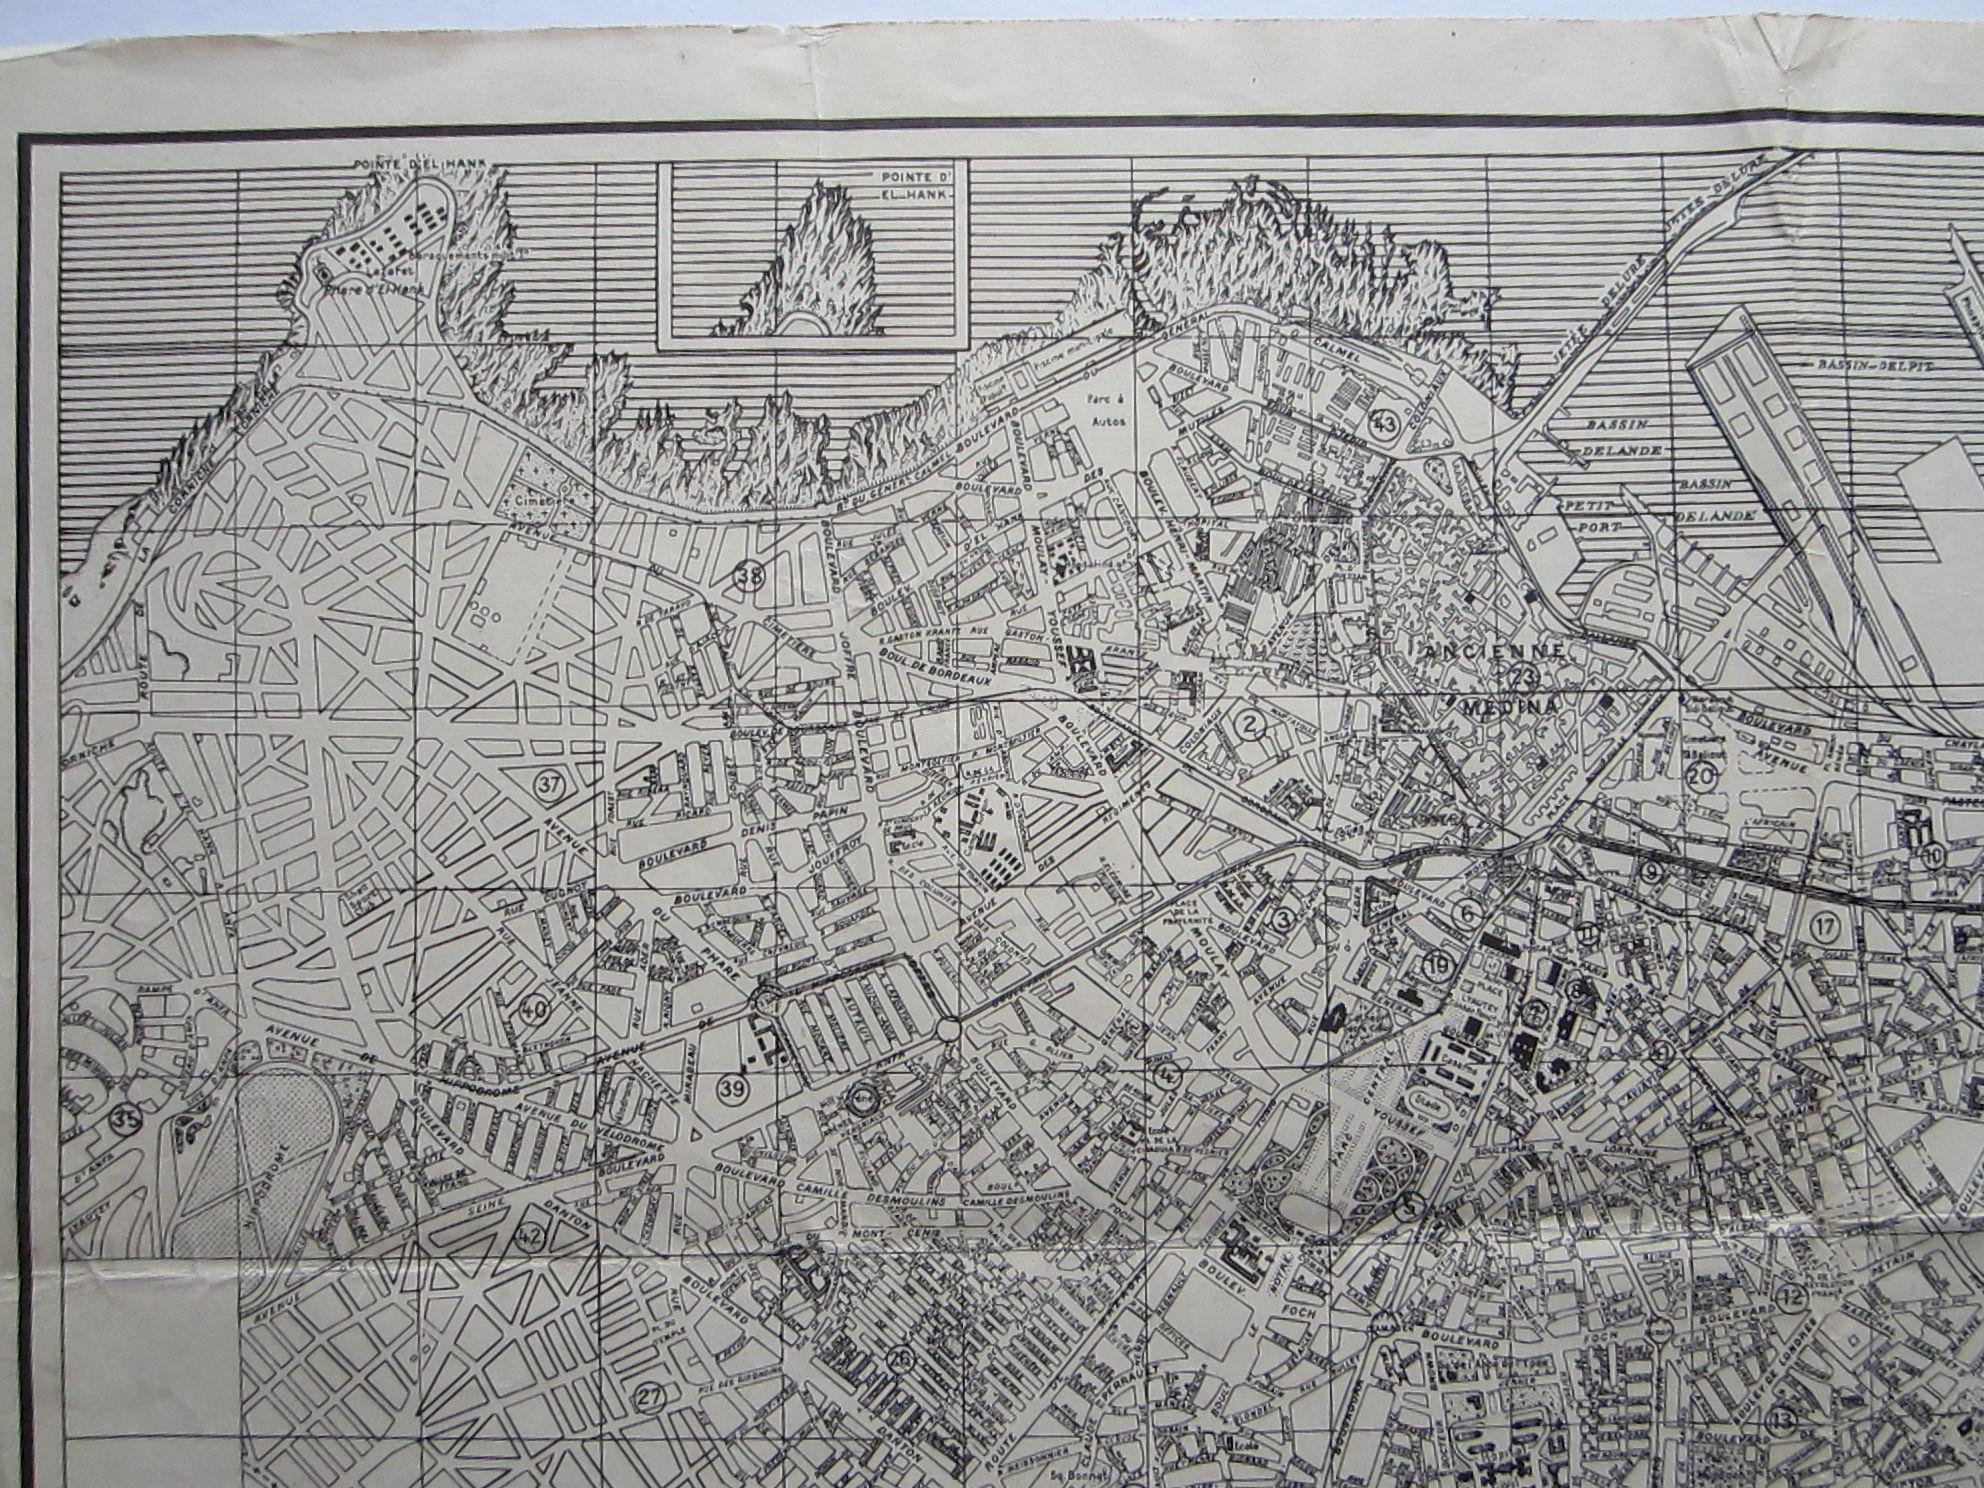 Plan de Casablanca … Reproduced by 954th Engineer Co. (TOP) (AVN) (photo 3)